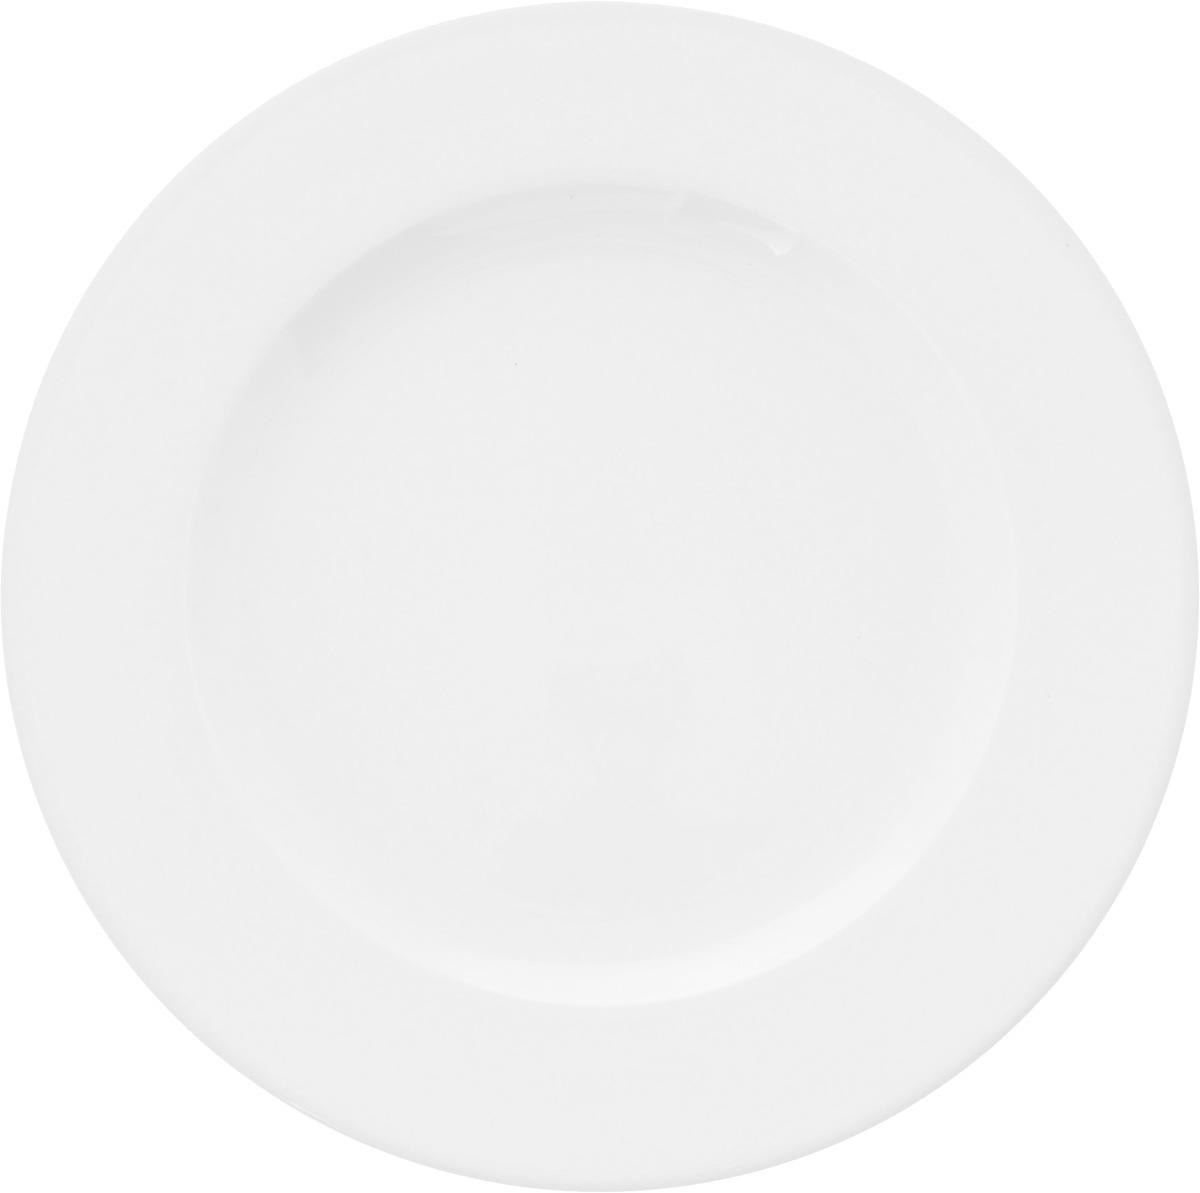 Тарелка Ariane Прайм, диаметр 24 см